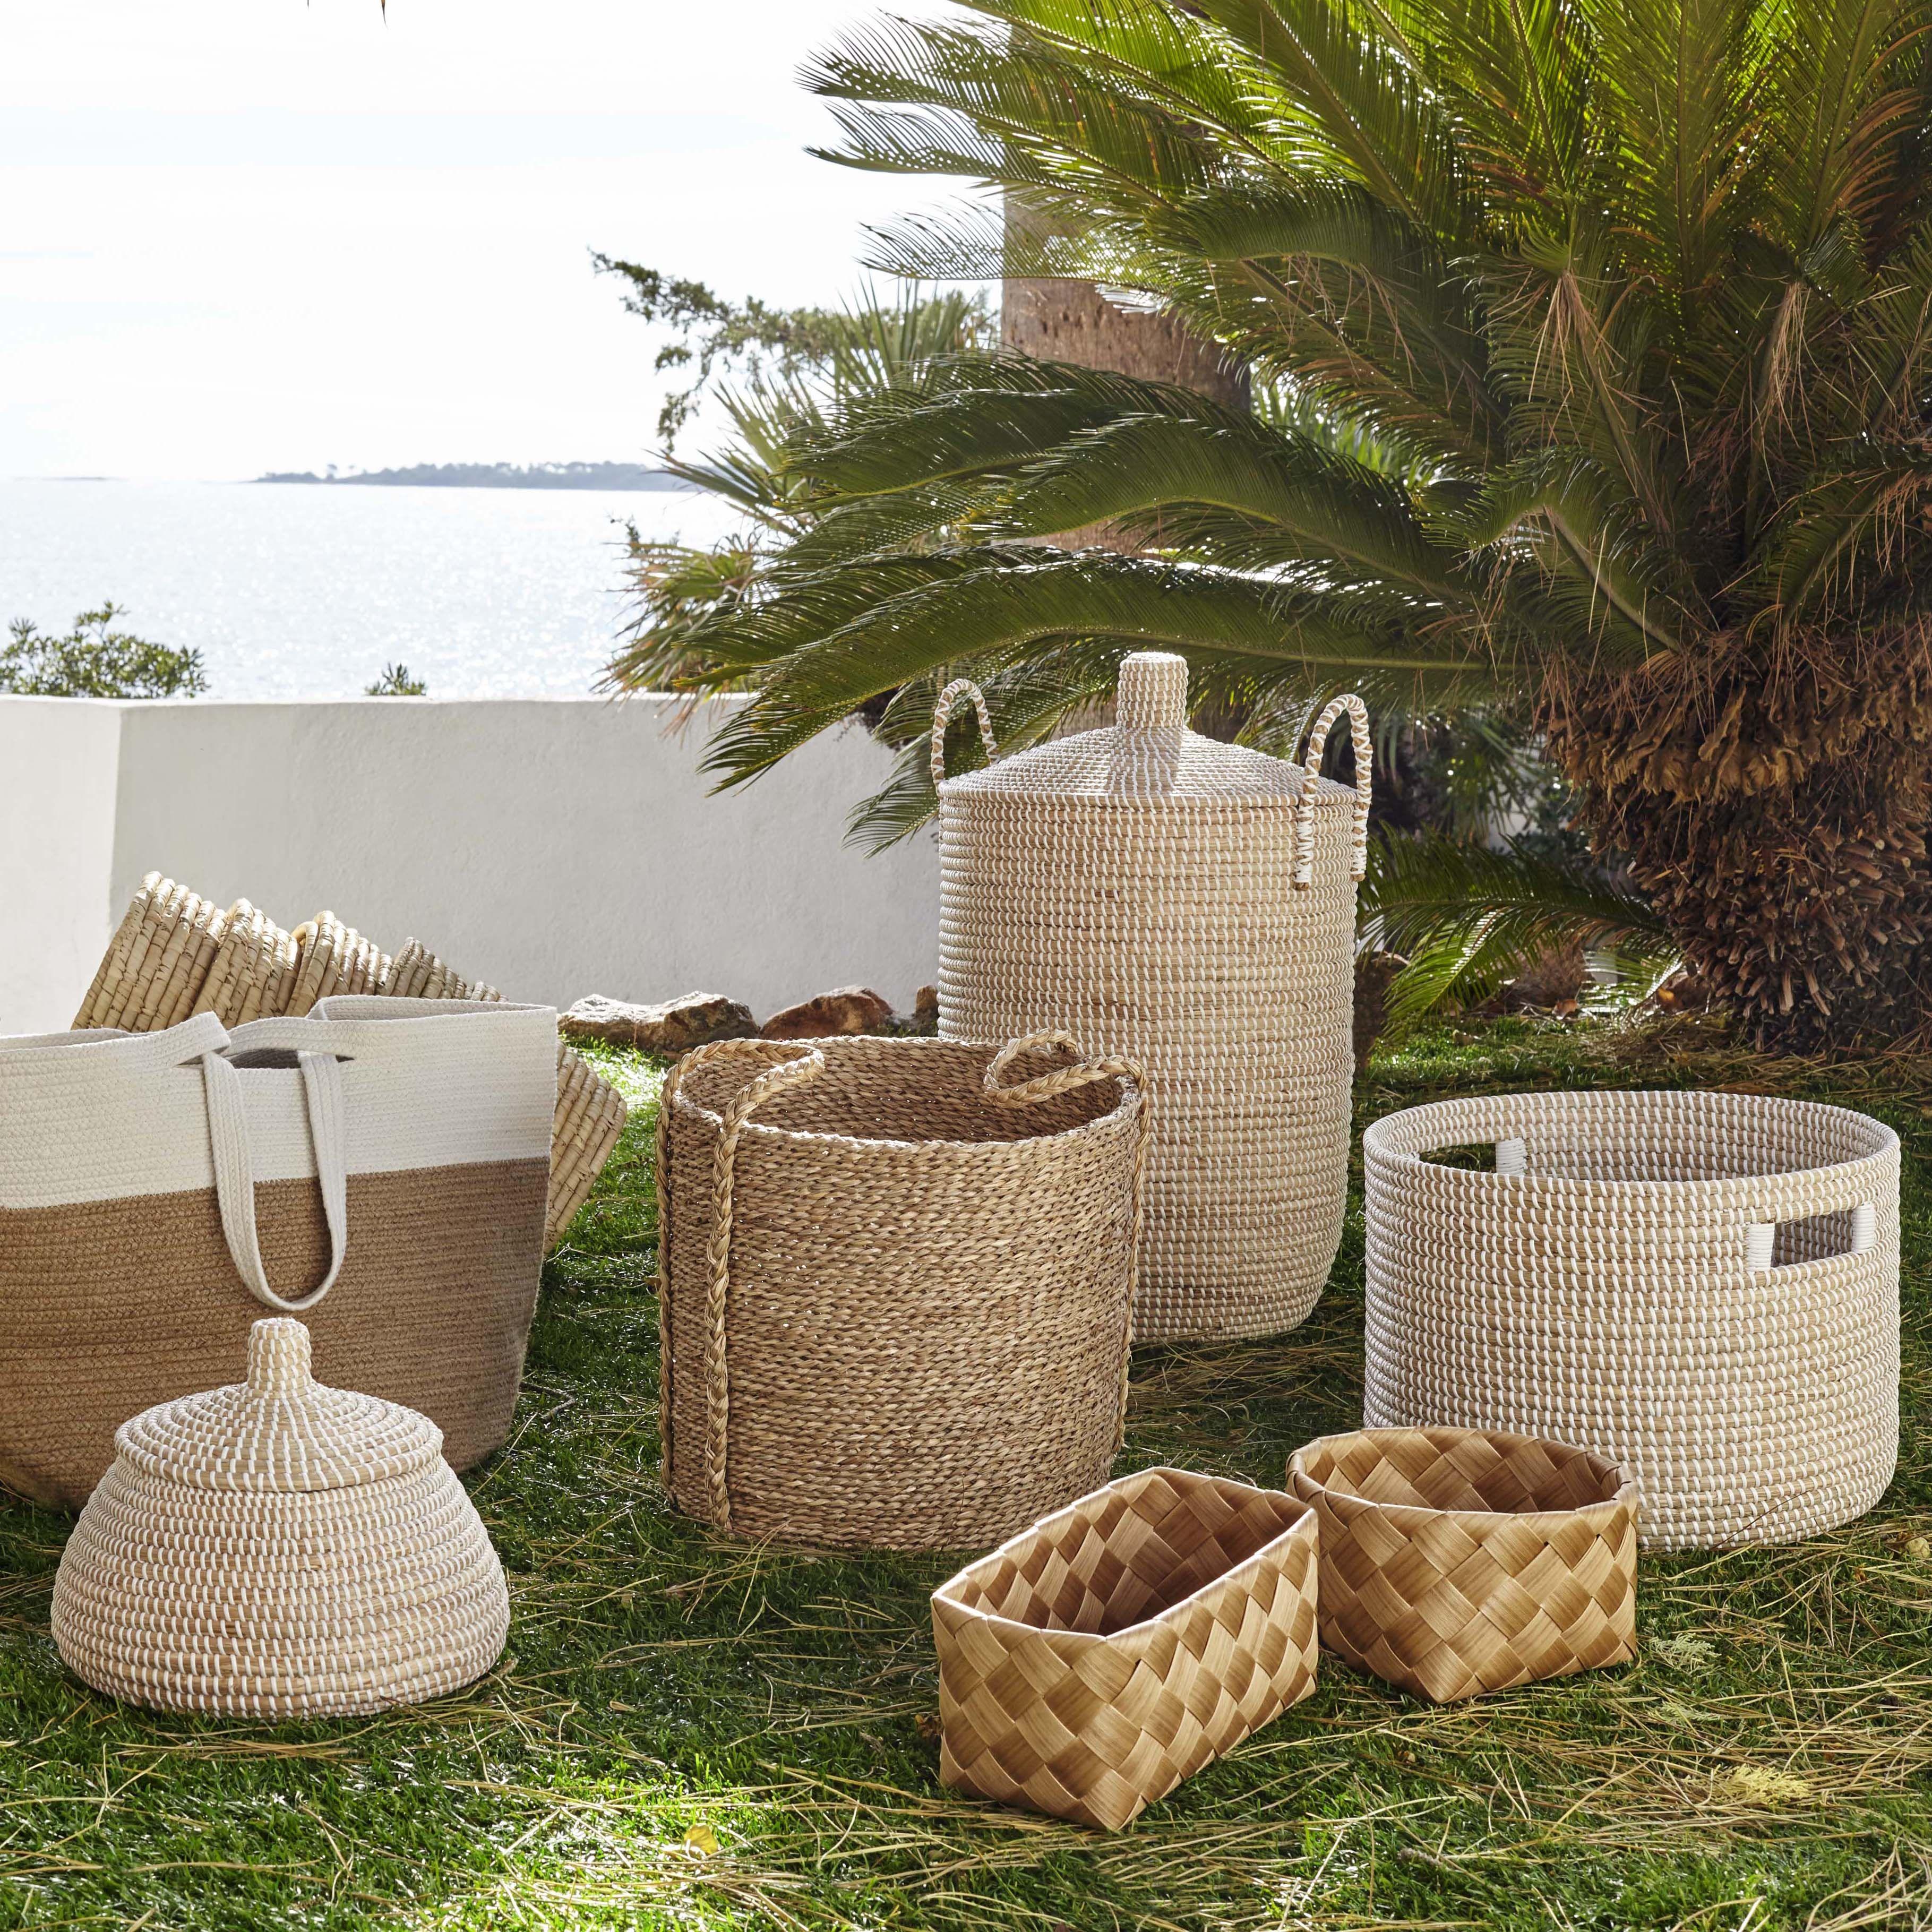 Jogga Panier 70cm Avec Couvercle En Jonc De Mer Bohemian Style Decor Habitat Garden Decorative Wicker Basket